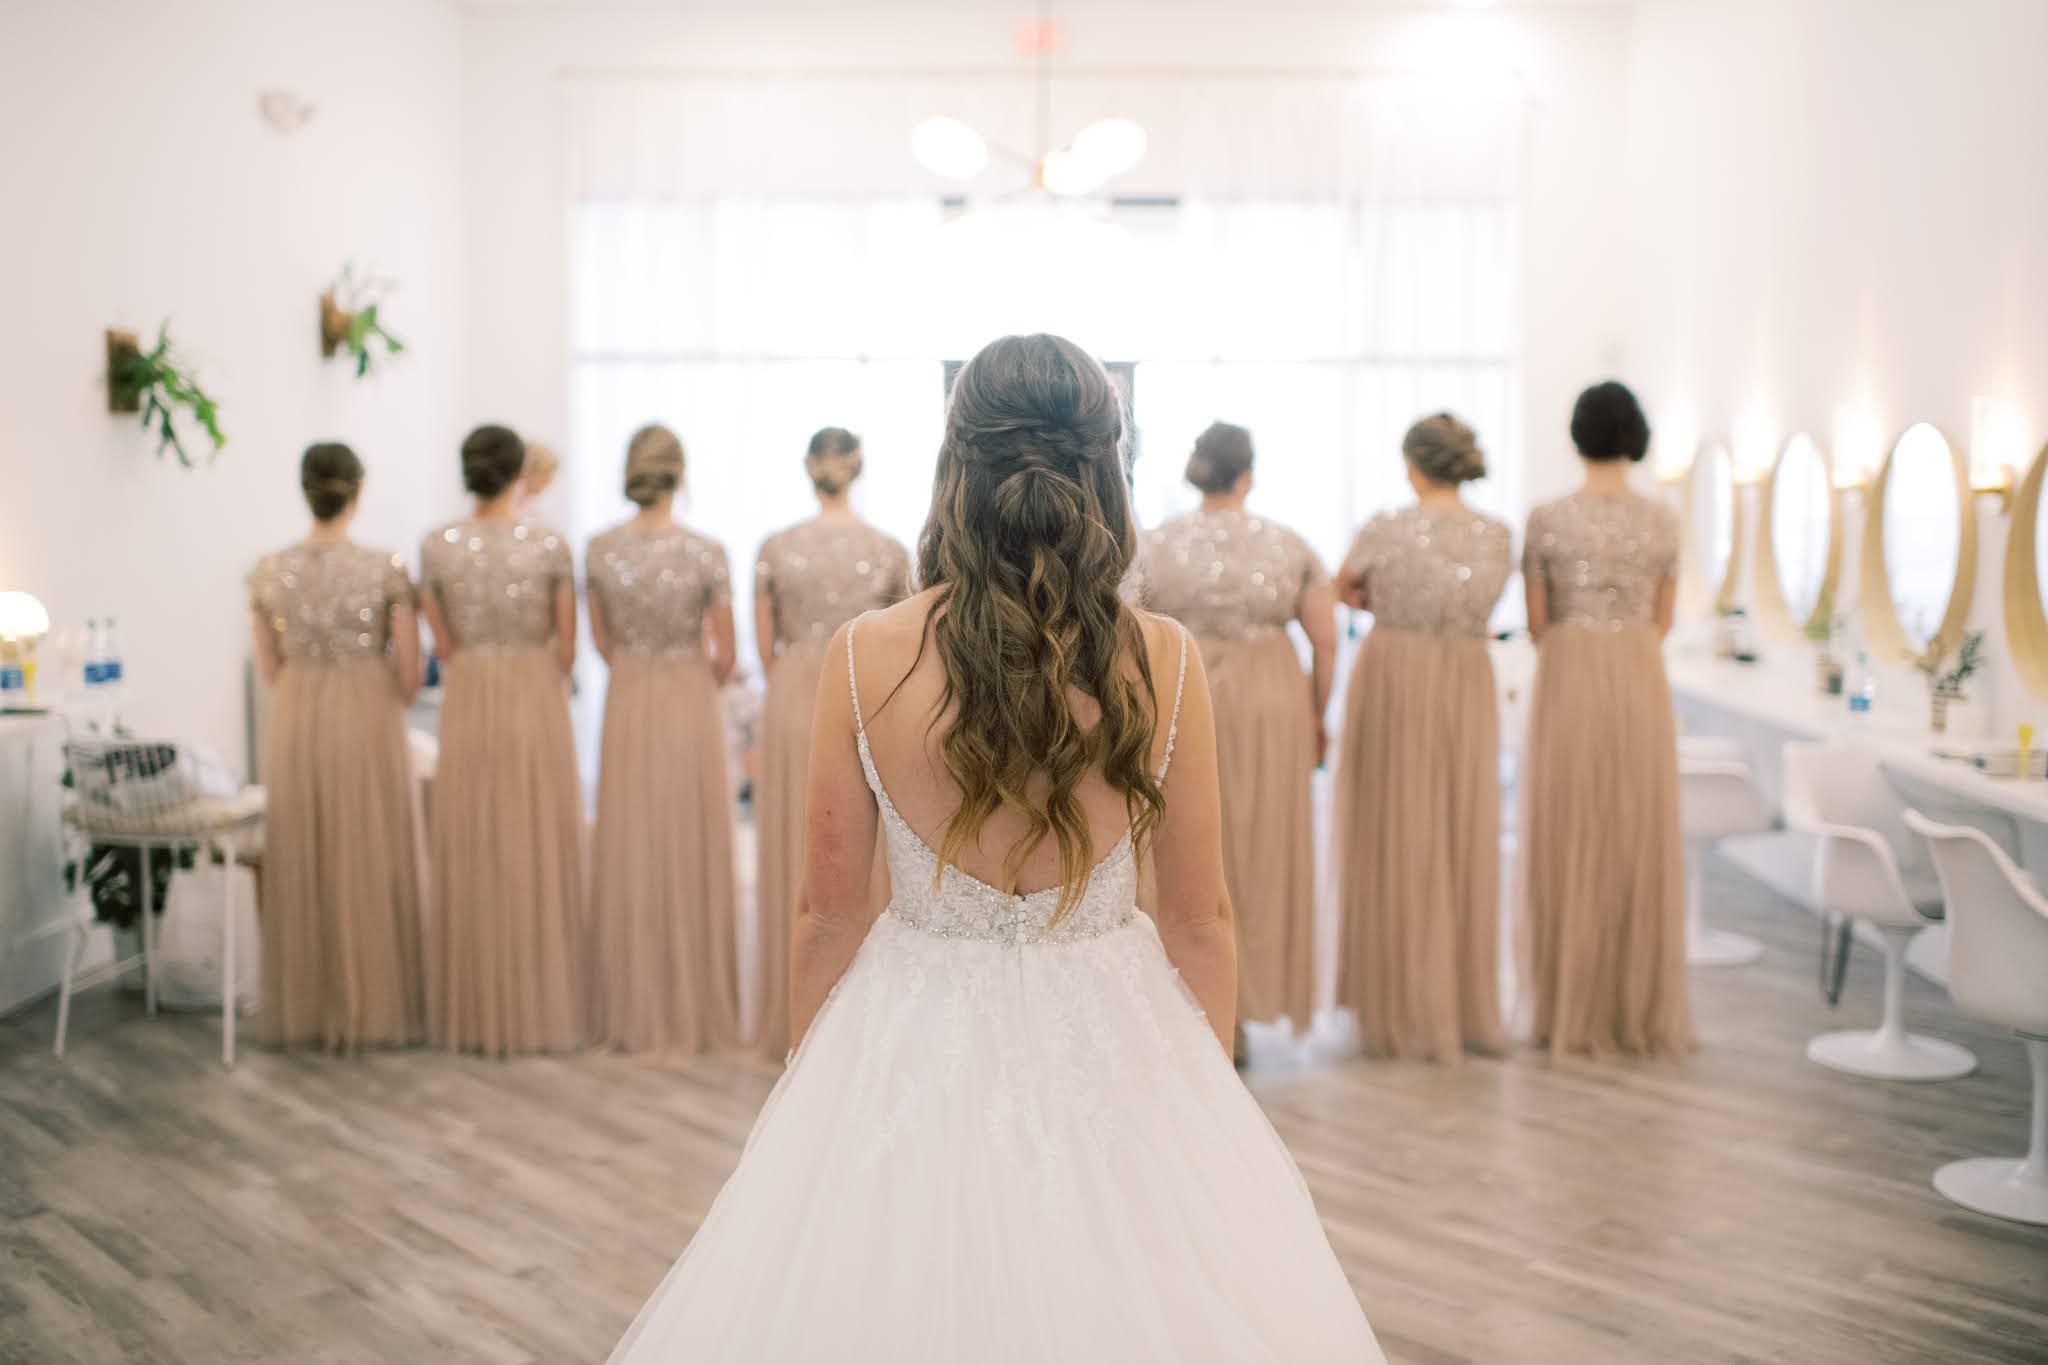 Bridal Prep Location Charleston - Chasing Cinderella